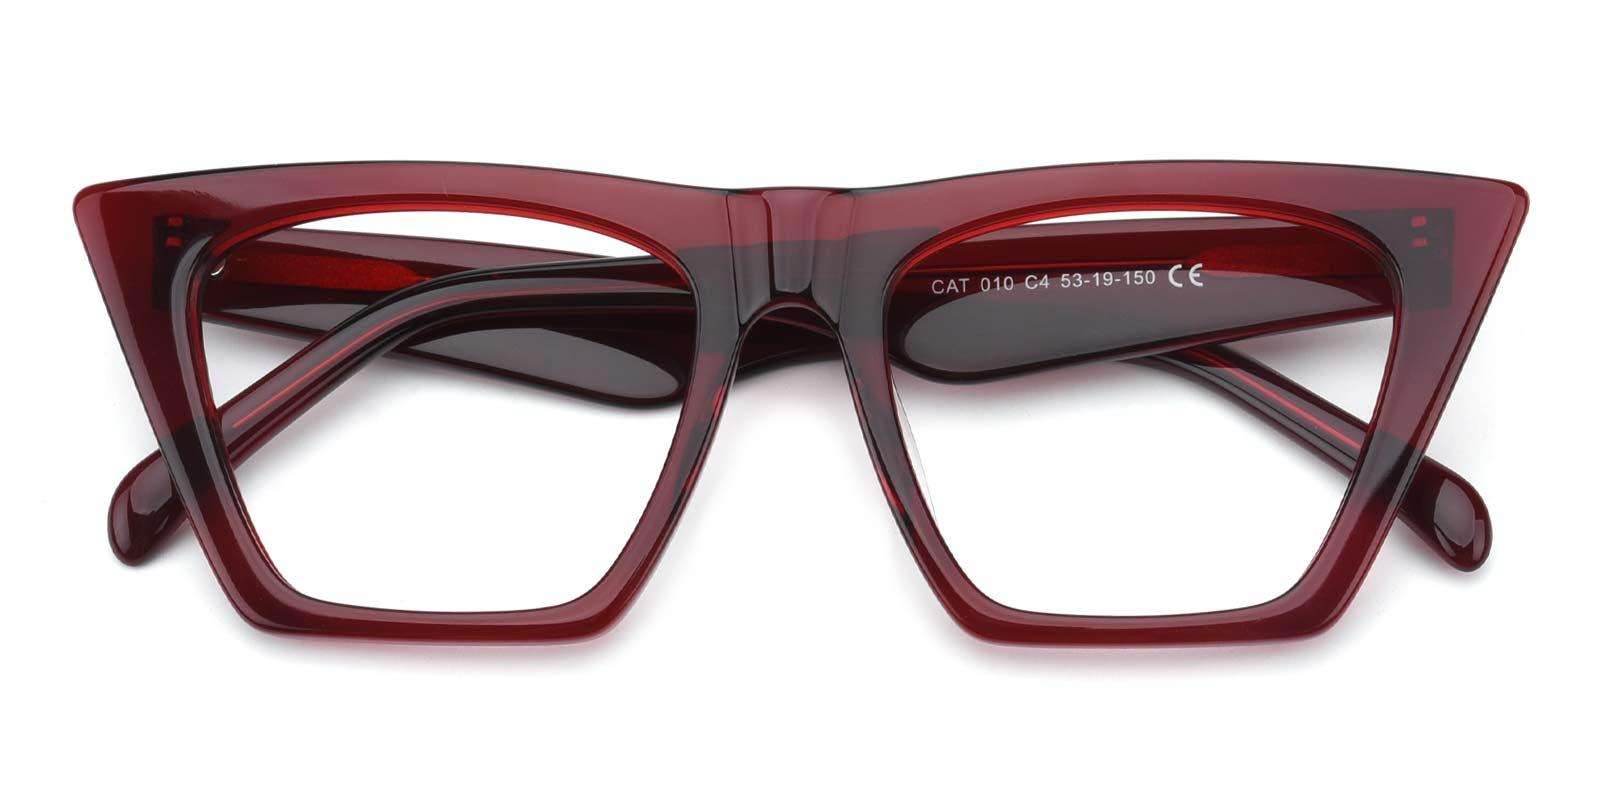 Alva-Red-Cat-Acetate-Eyeglasses-detail